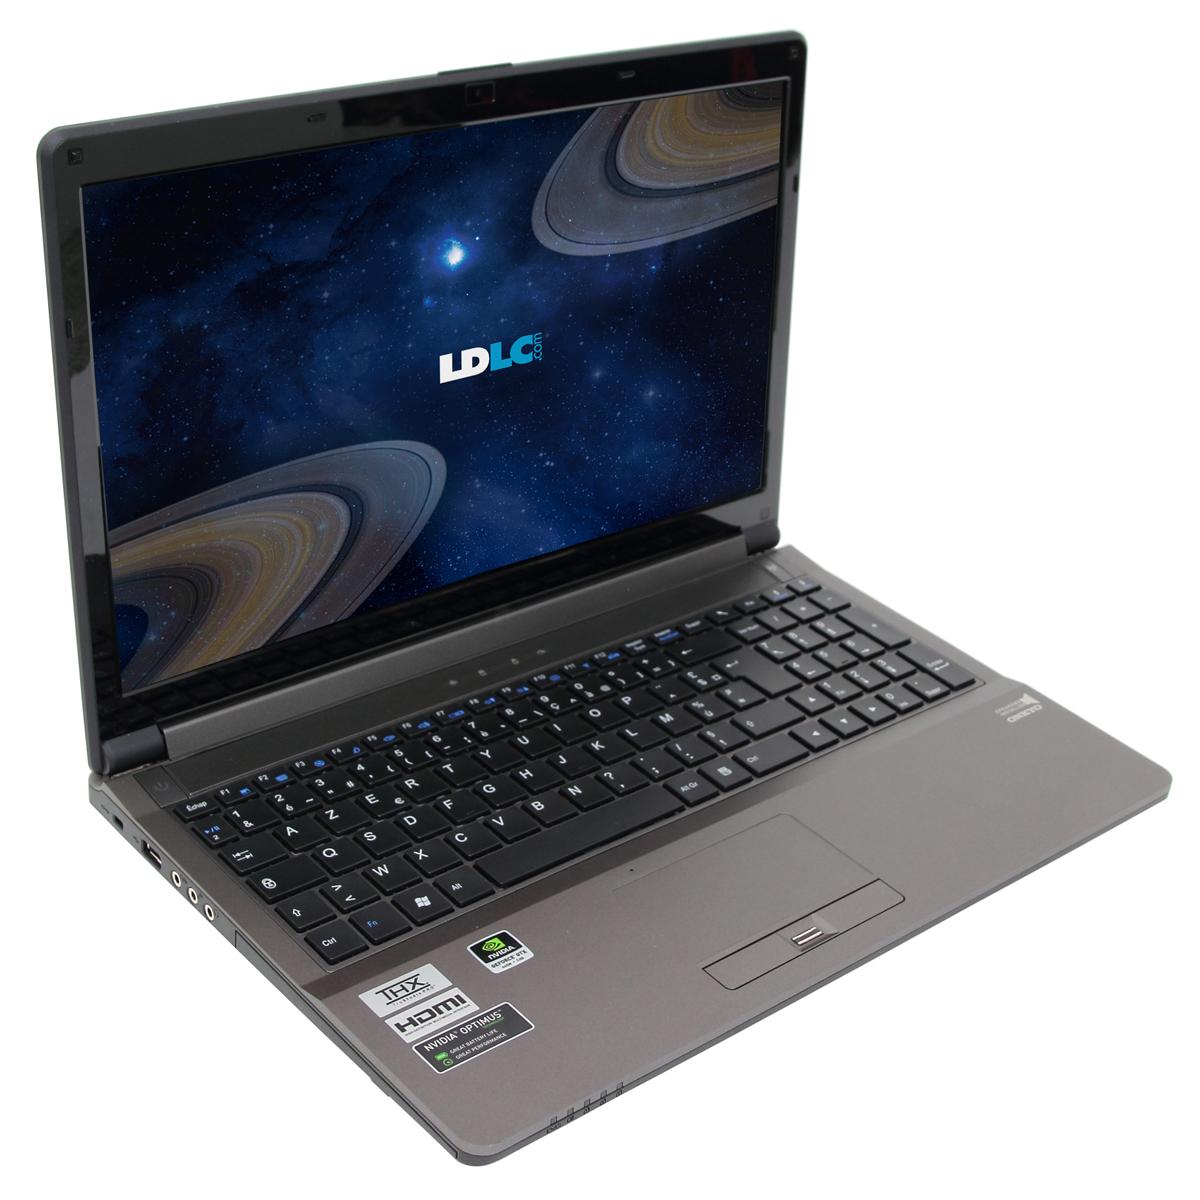 "PC portable LDLC Saturne SB6-I7-16-S1H10 Intel Core i7-3630QM 16 Go SSD 120 Go + HDD 1 To 15.6"" LED NVIDIA GeForce GTX 660M Lecteur Blu-ray/Graveur DVD Wi-Fi N/Bluetooth Webcam (sans OS)"